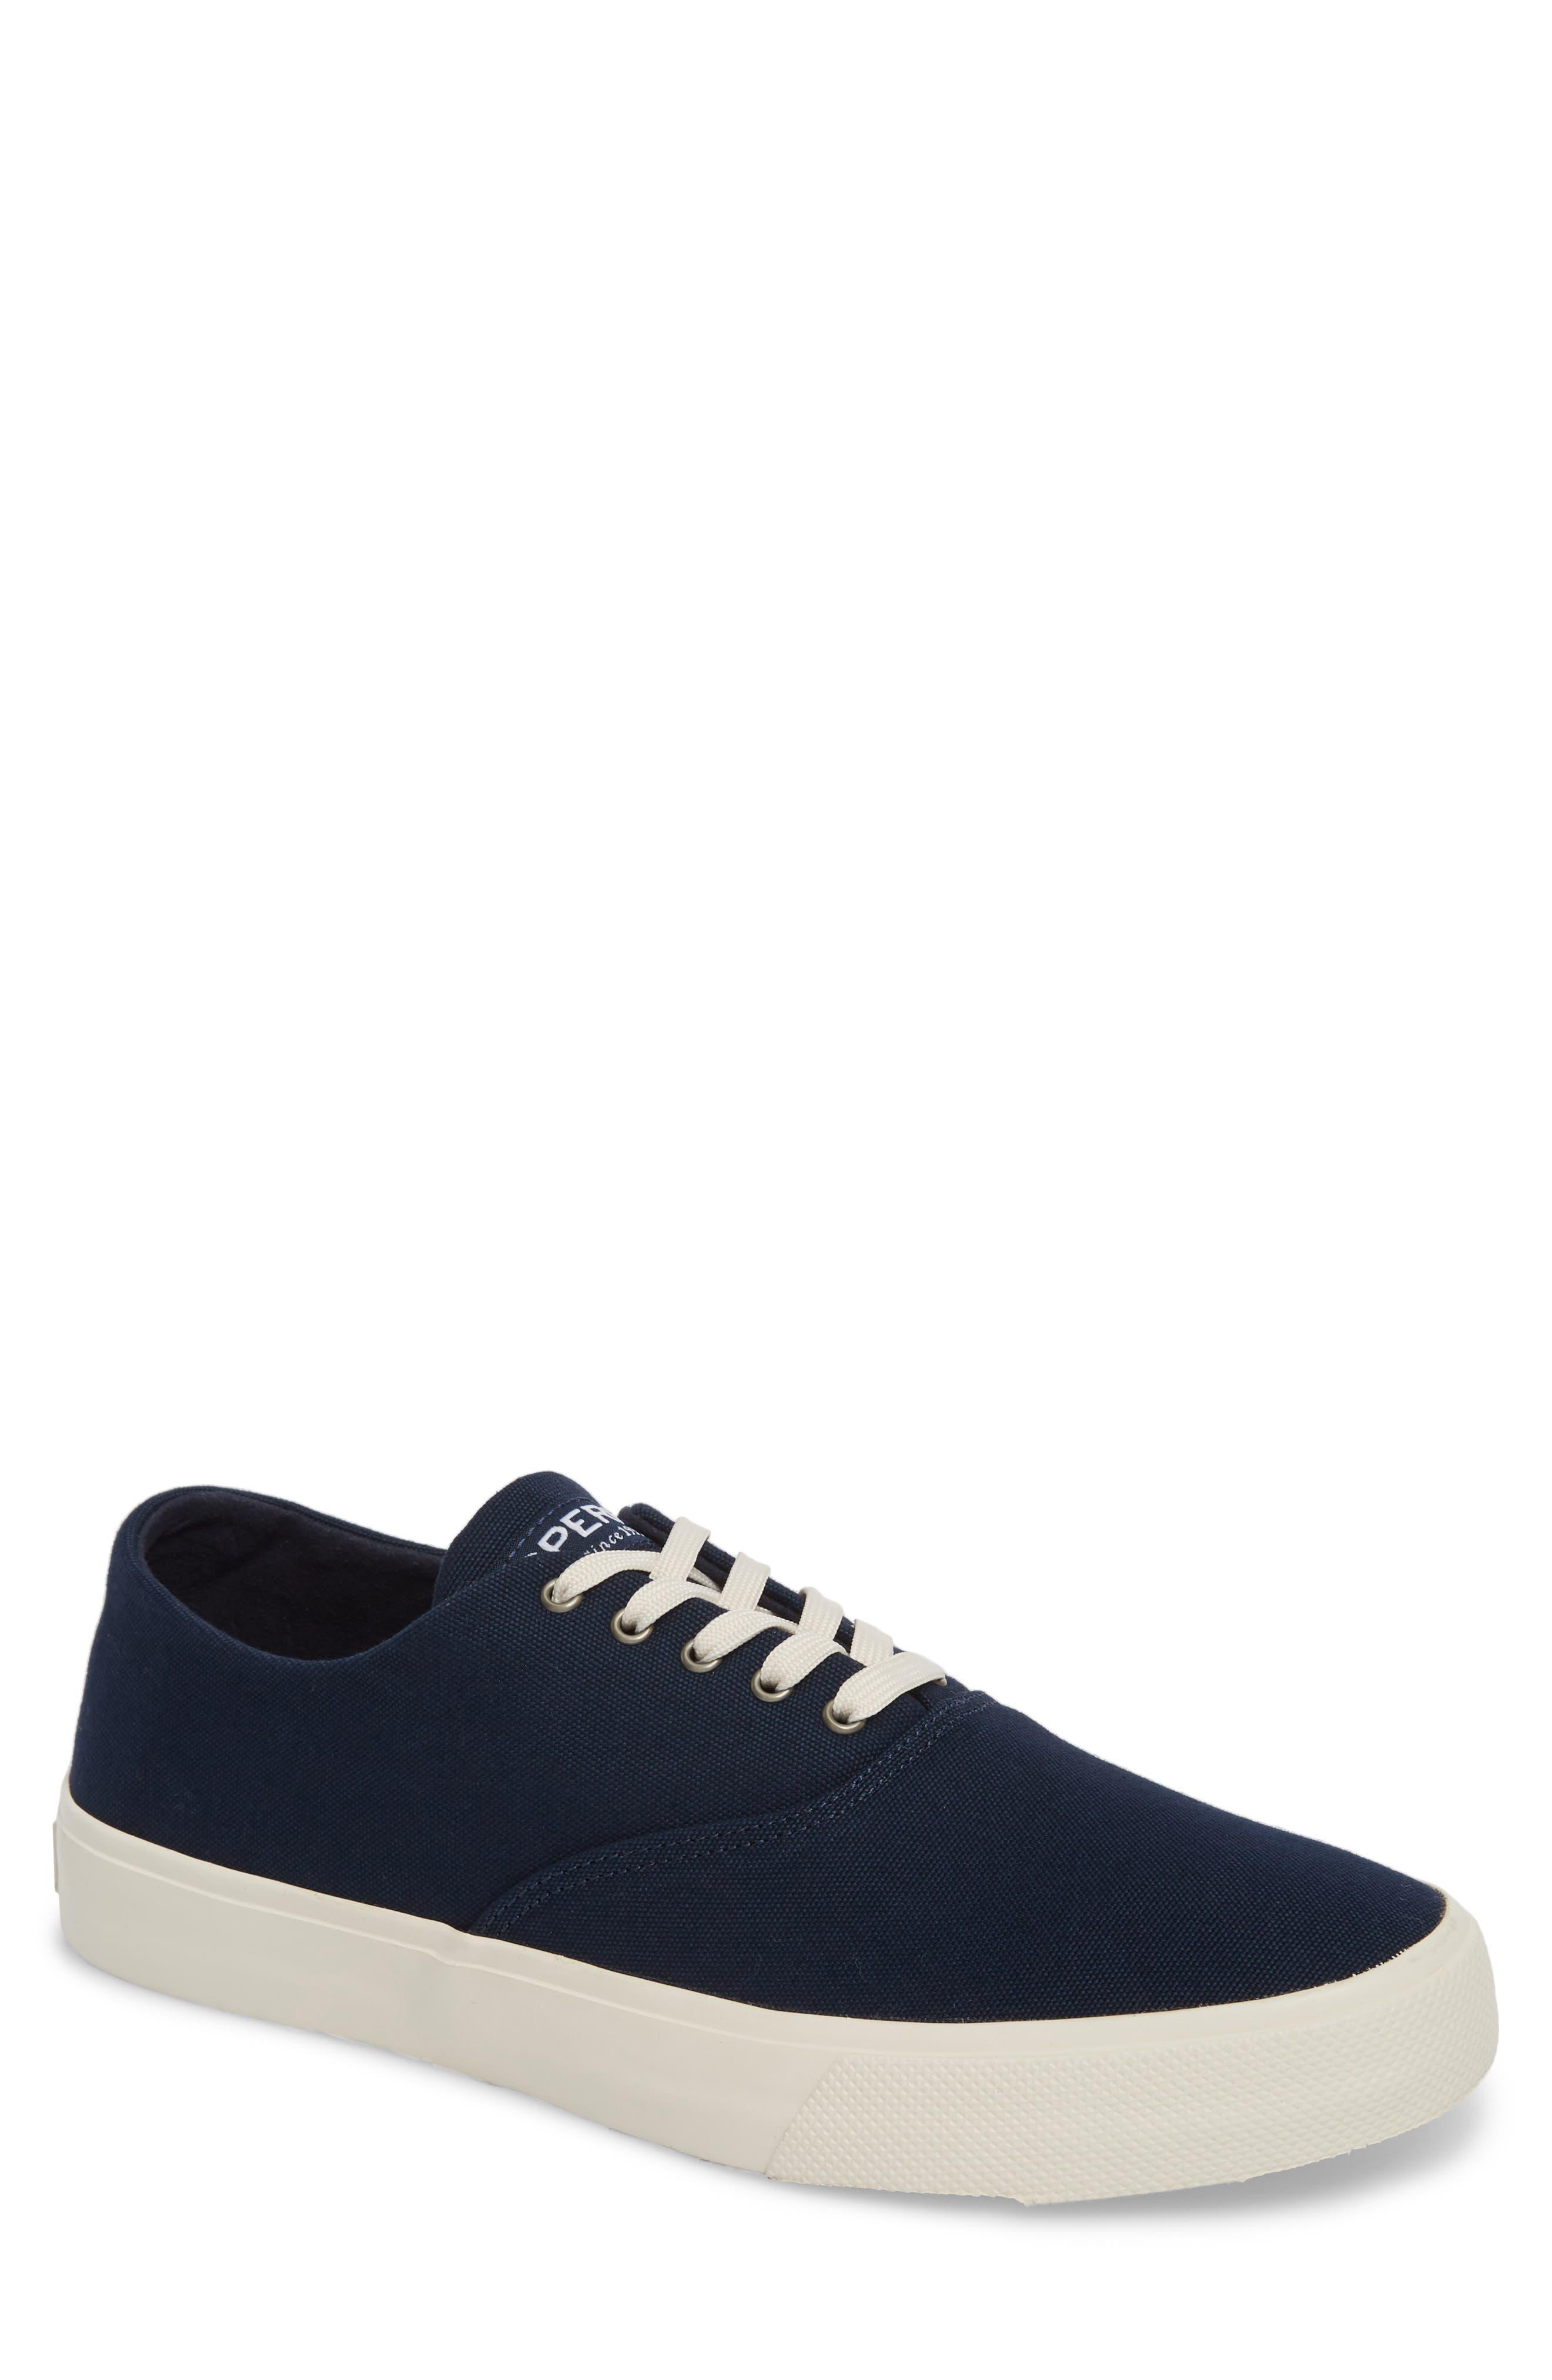 Captain's CVO Sneaker,                             Main thumbnail 1, color,                             Navy Fabric